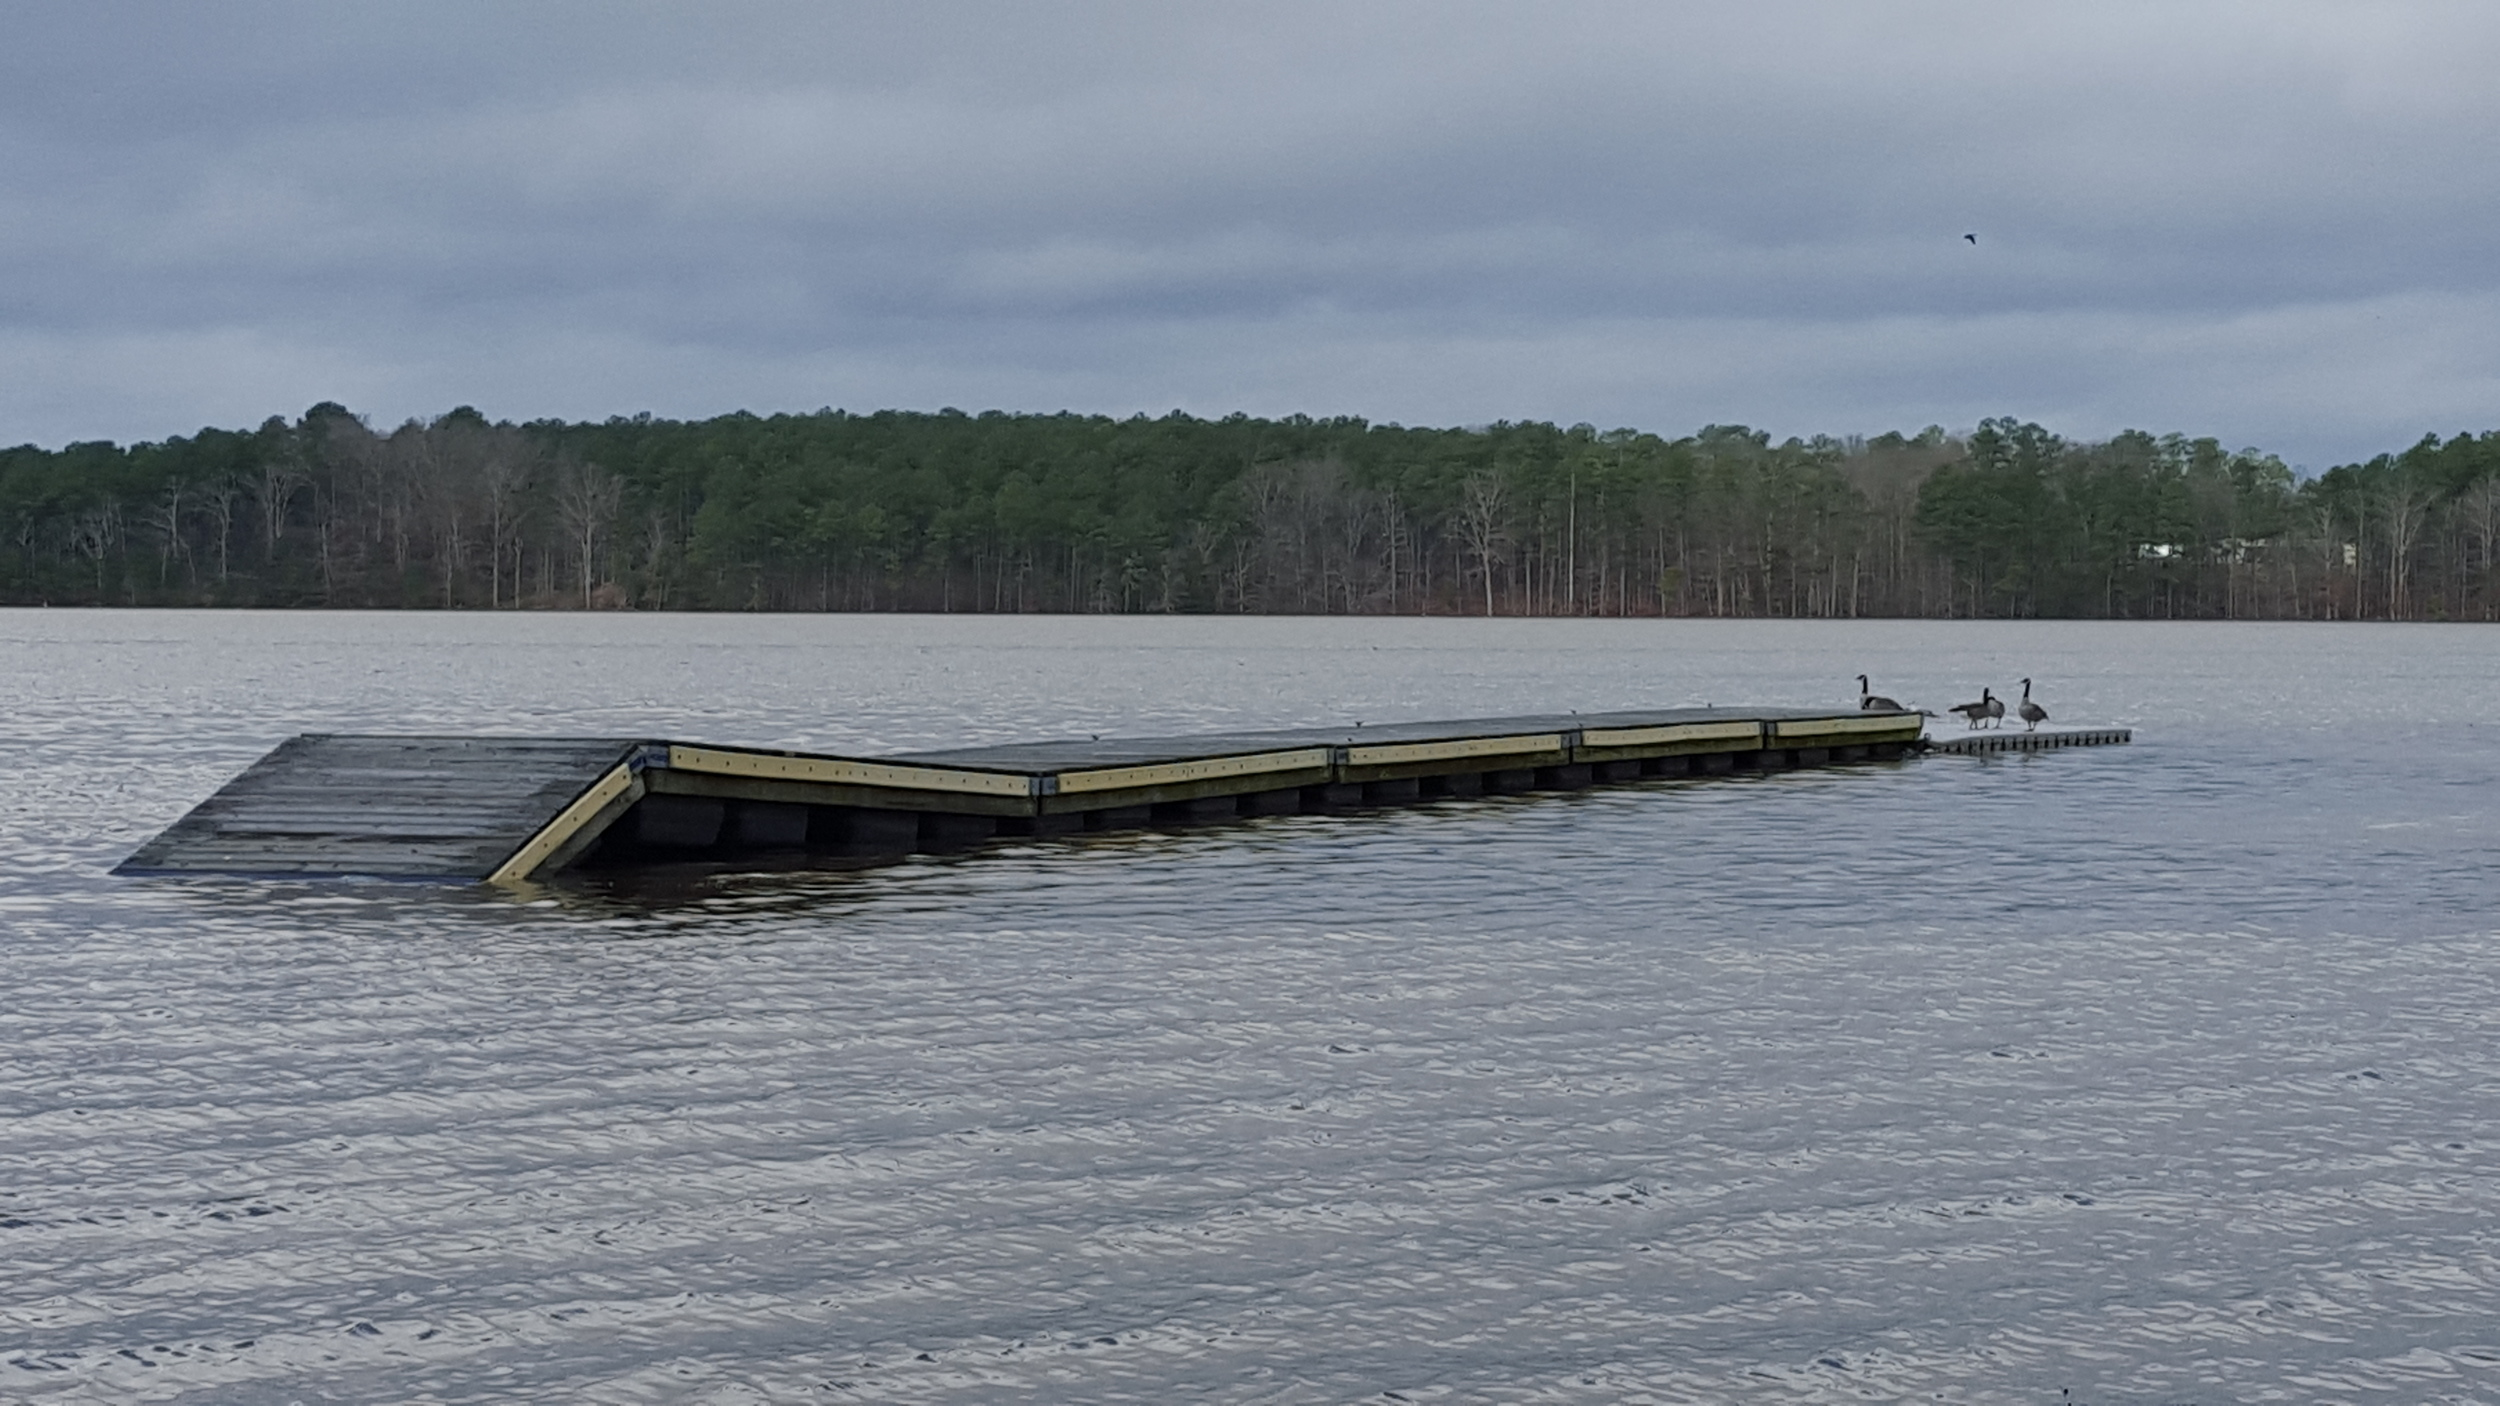 Dock as an island